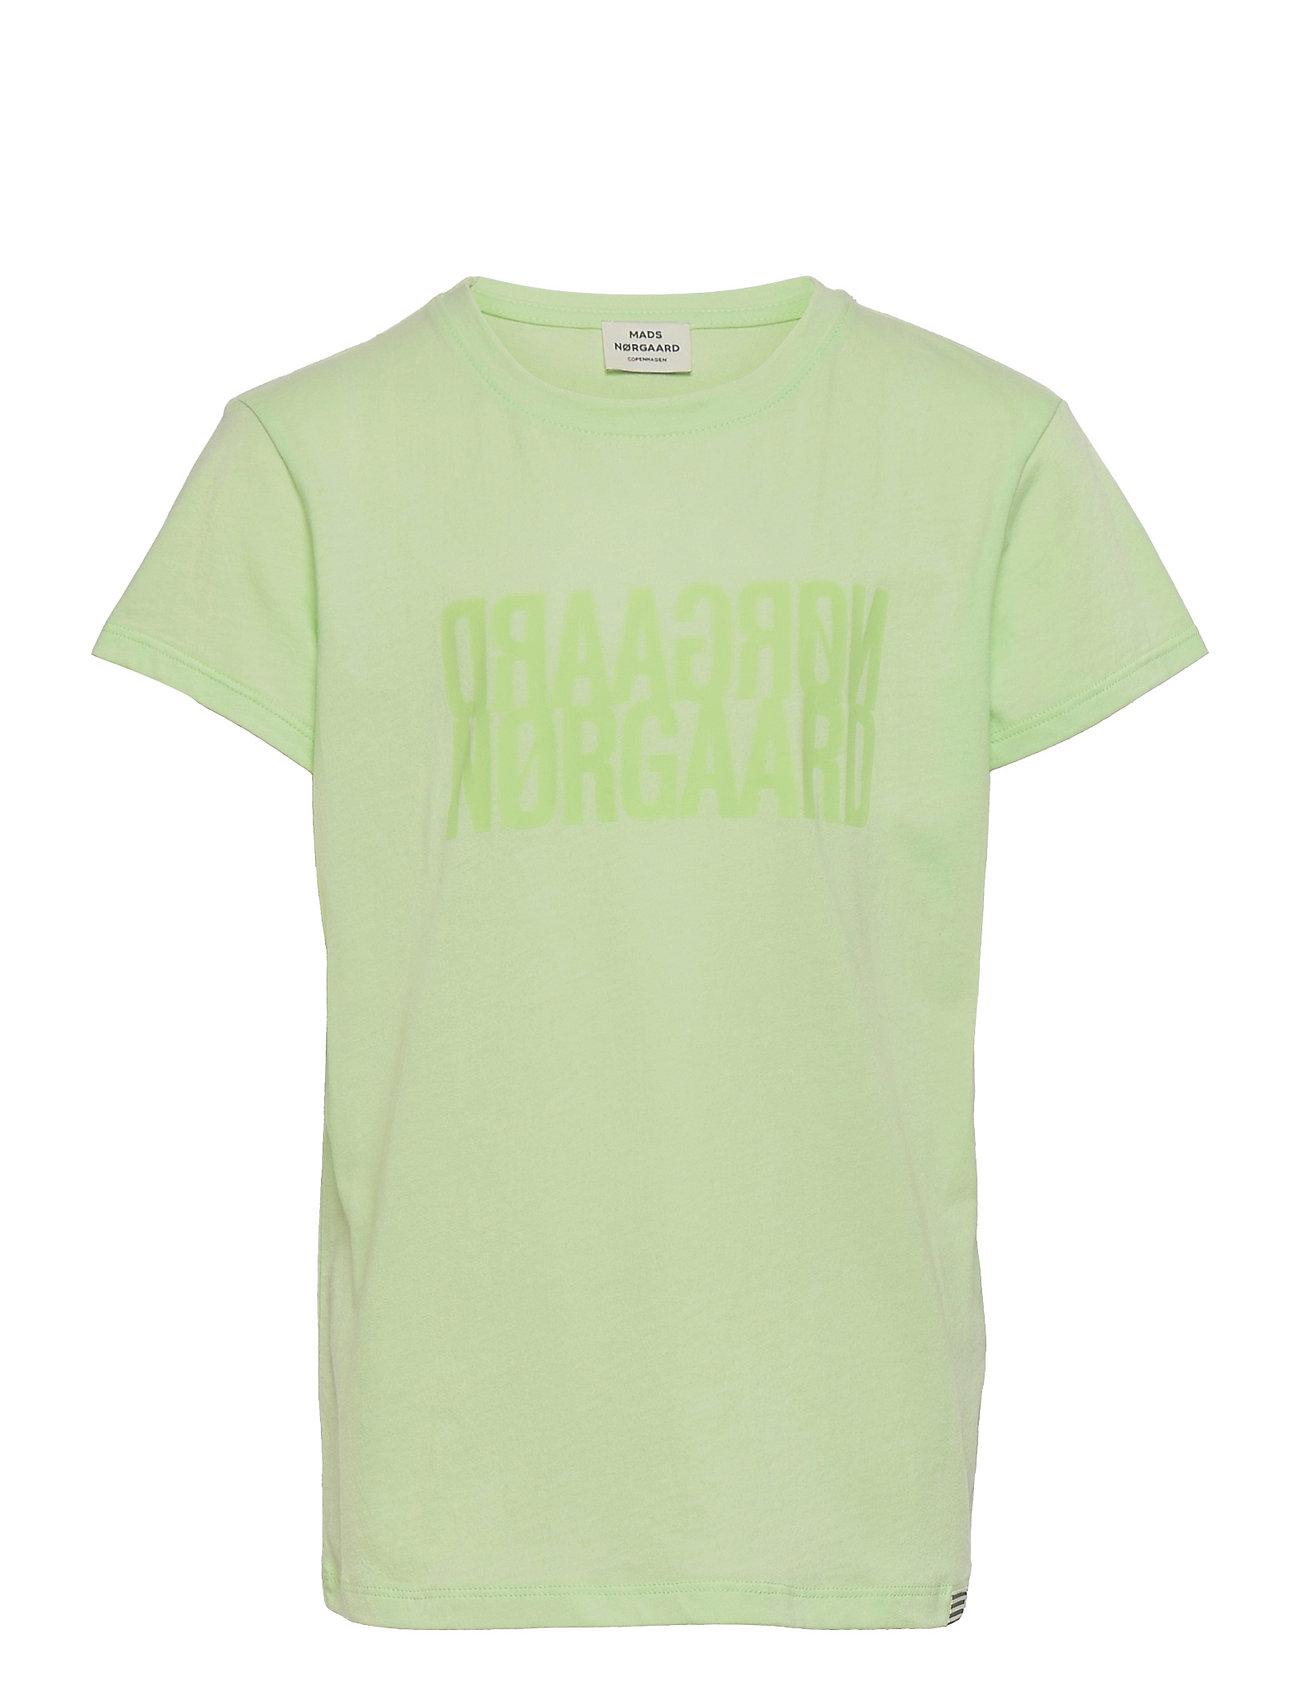 Single Organic Tuvina T-shirt Grøn Mads Nørgaard